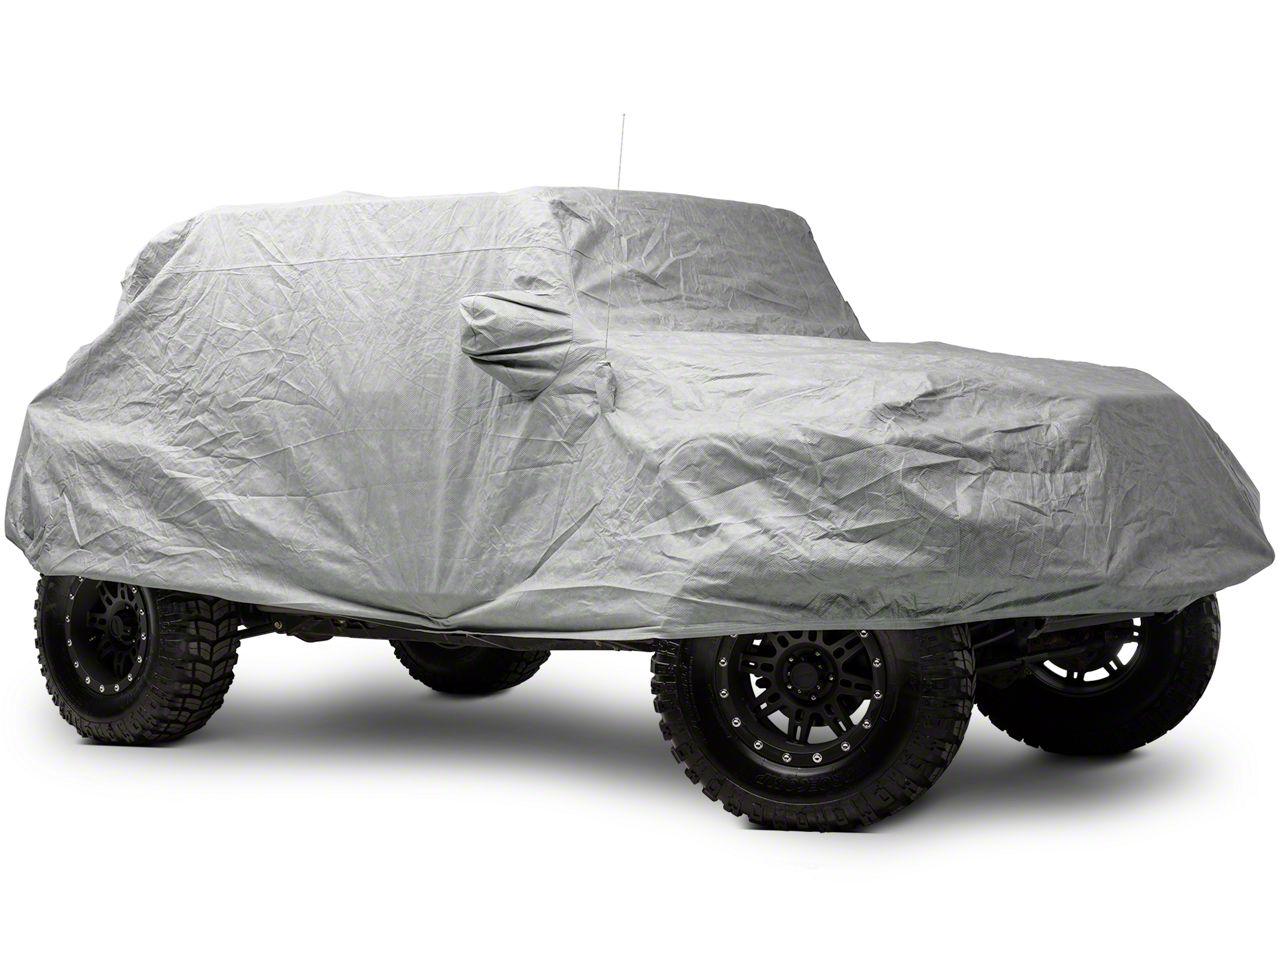 Smittybilt Full Climate Jeep Cover (07-18 Jeep Wrangler JK 4 Door)